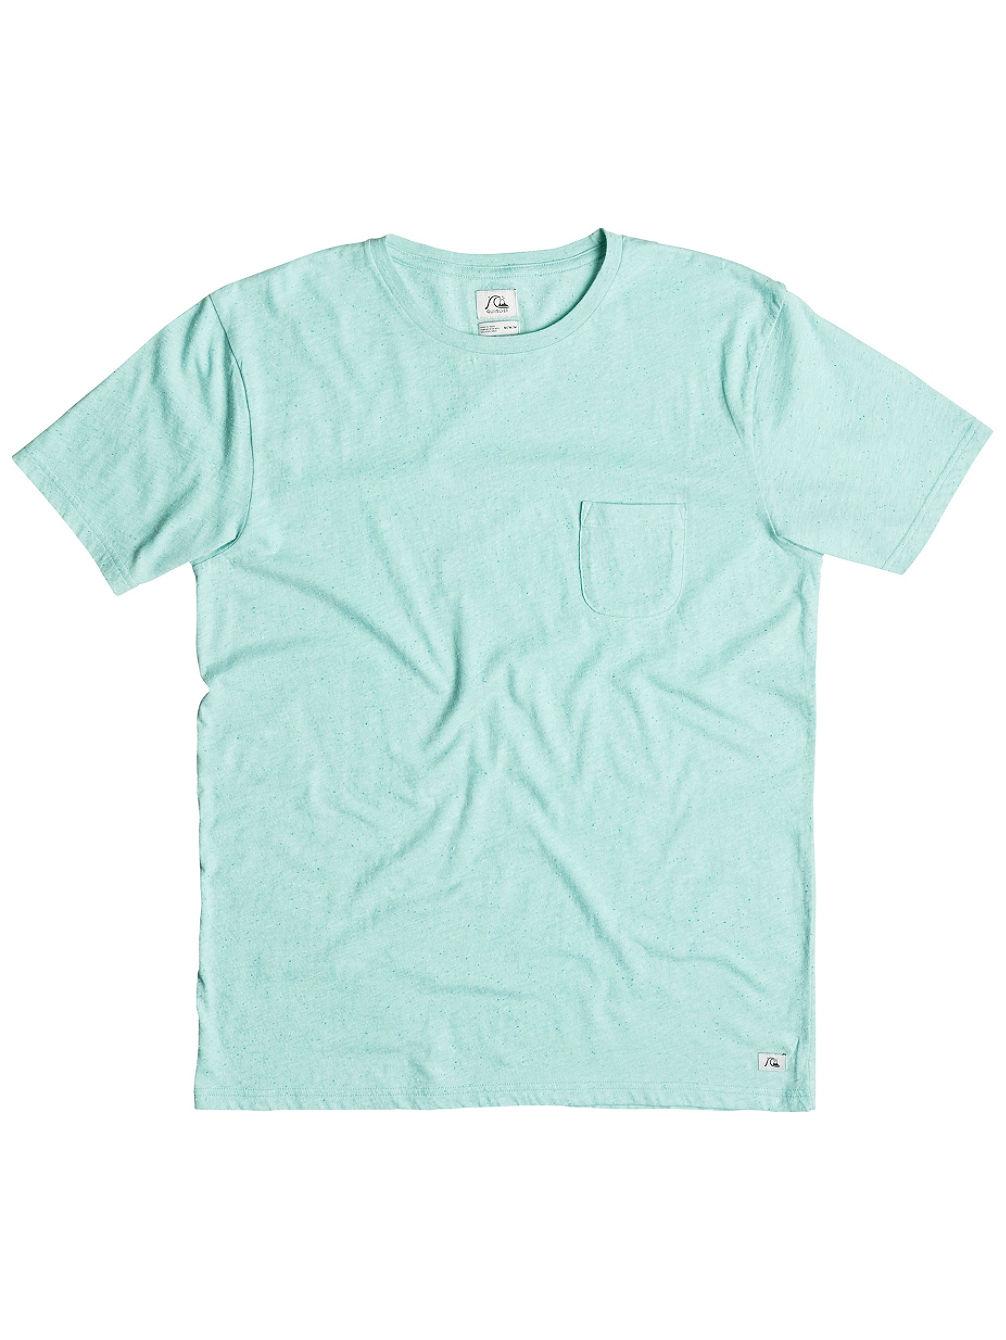 tropical-haven-t-shirt